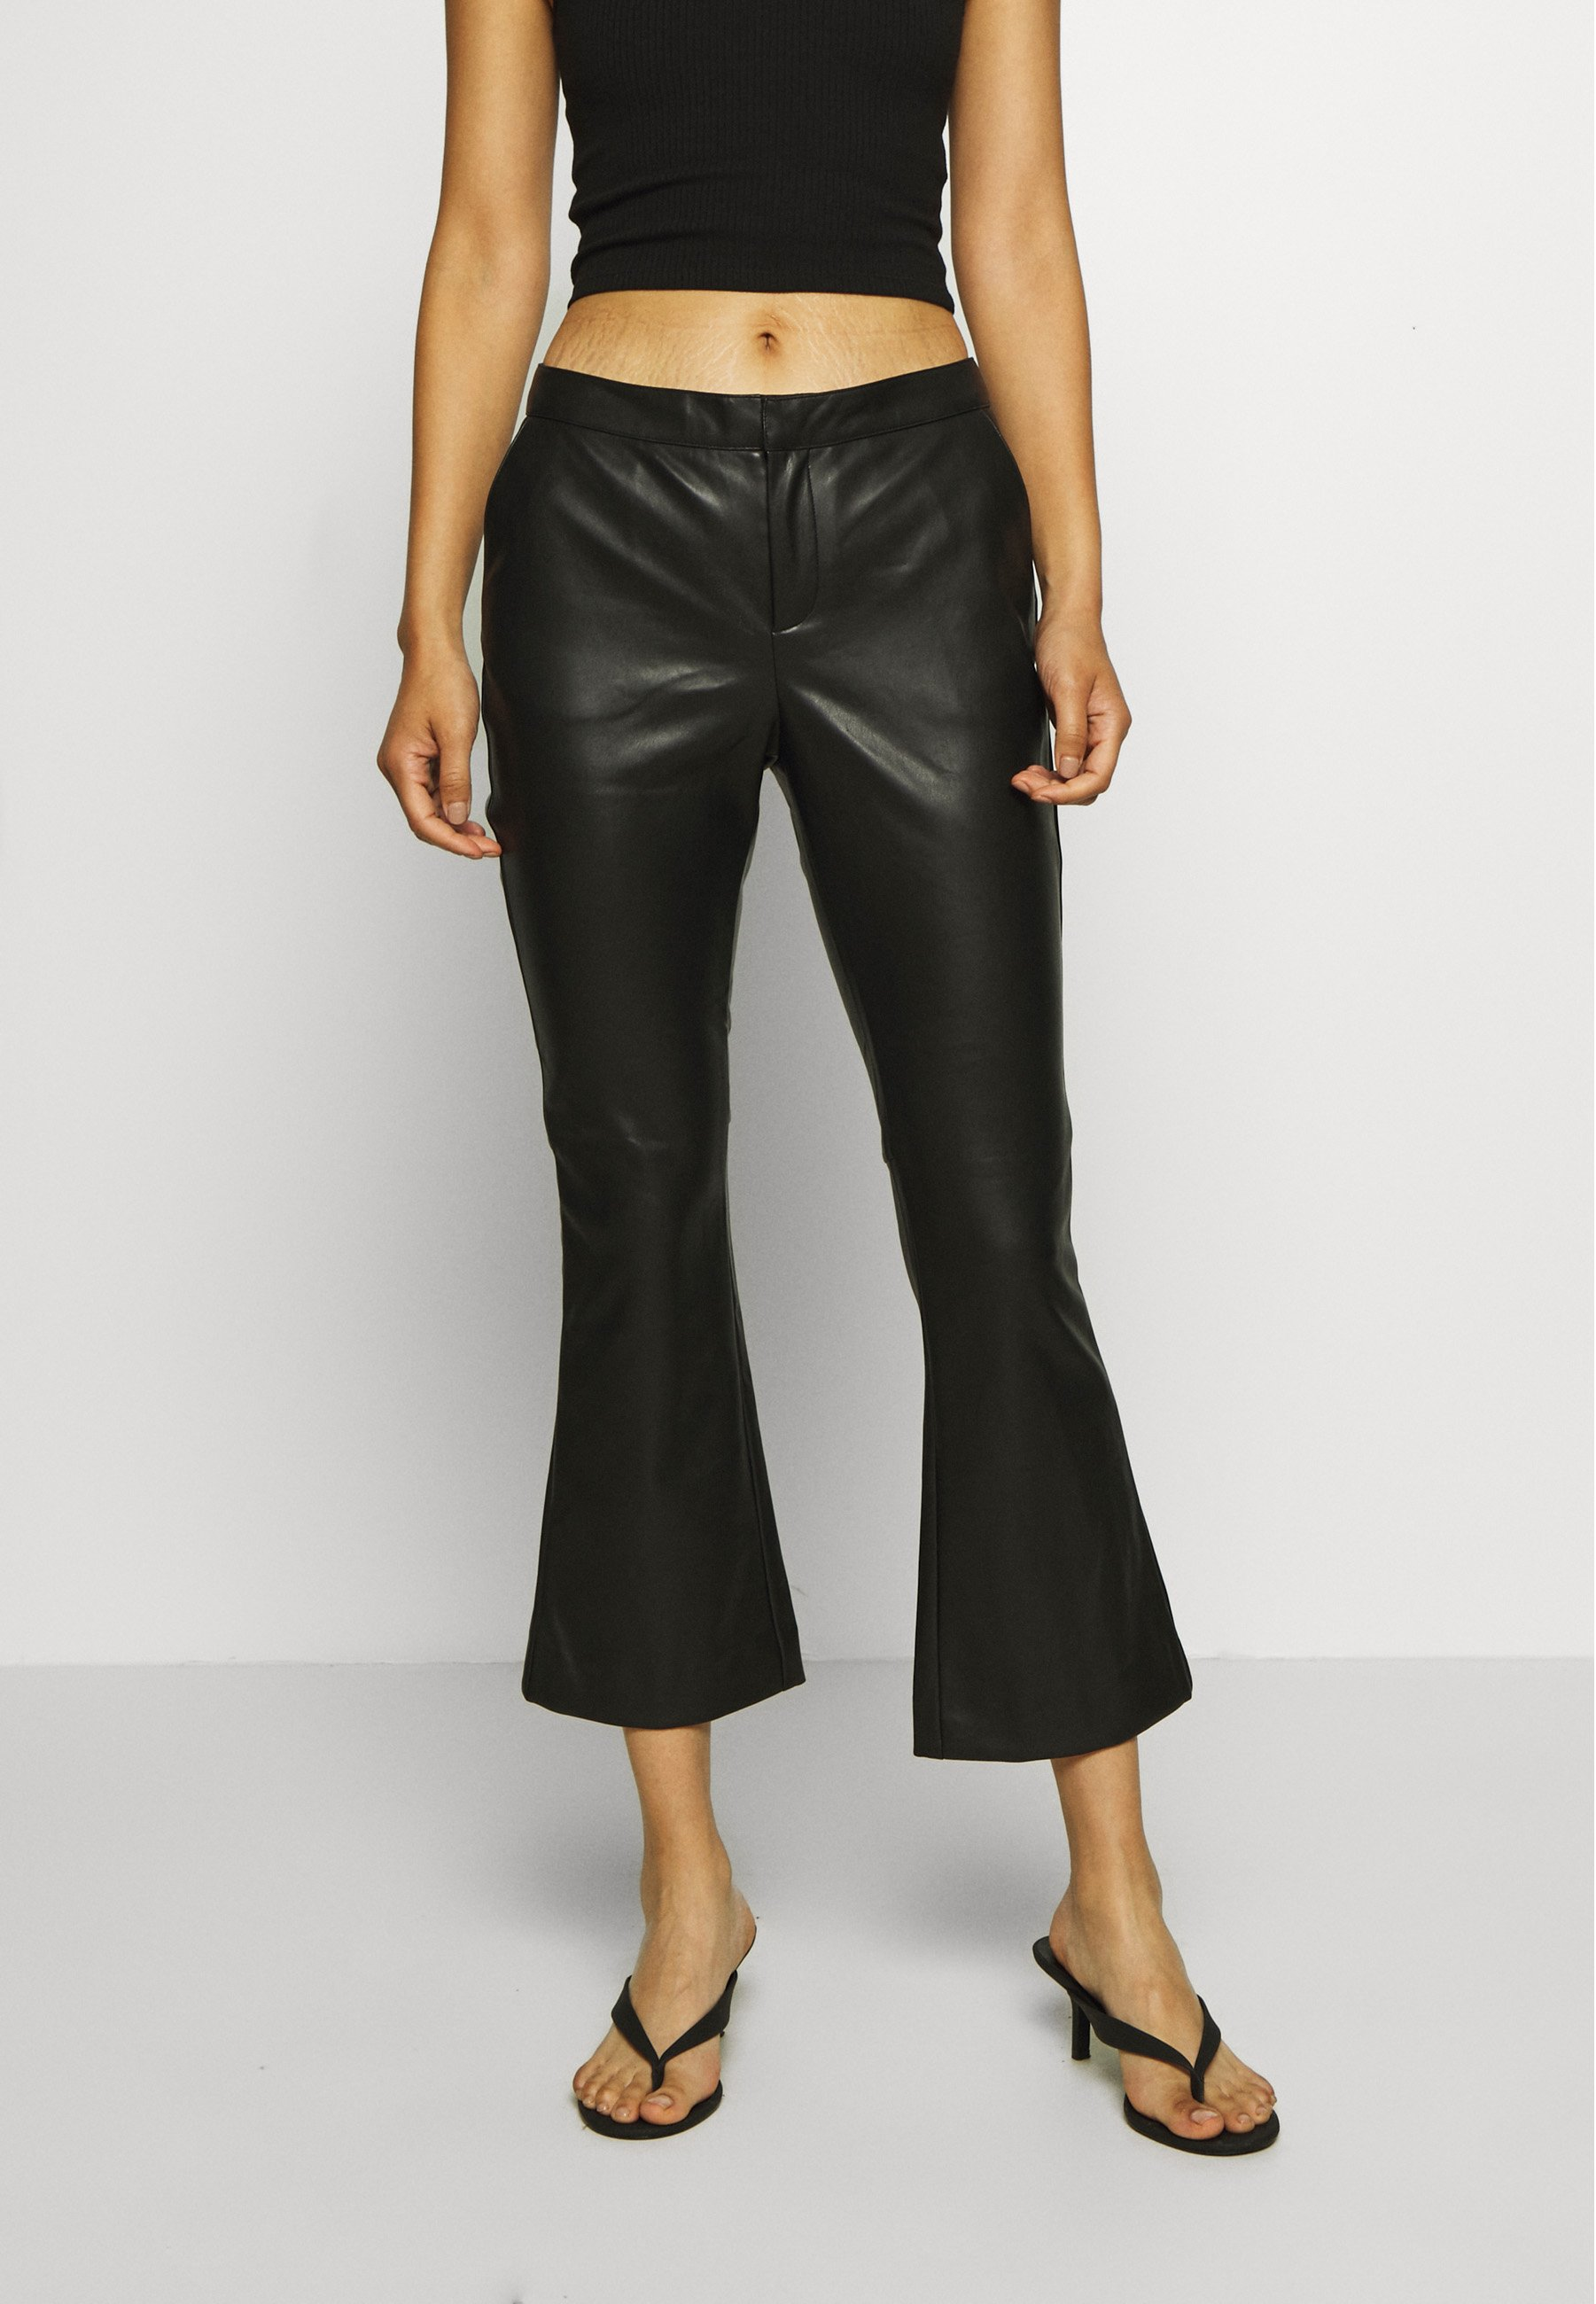 Diseñador Ropa de mujer Twist & Tango CORNELIA TROUSERS Pantalón de cuero black ABC4th